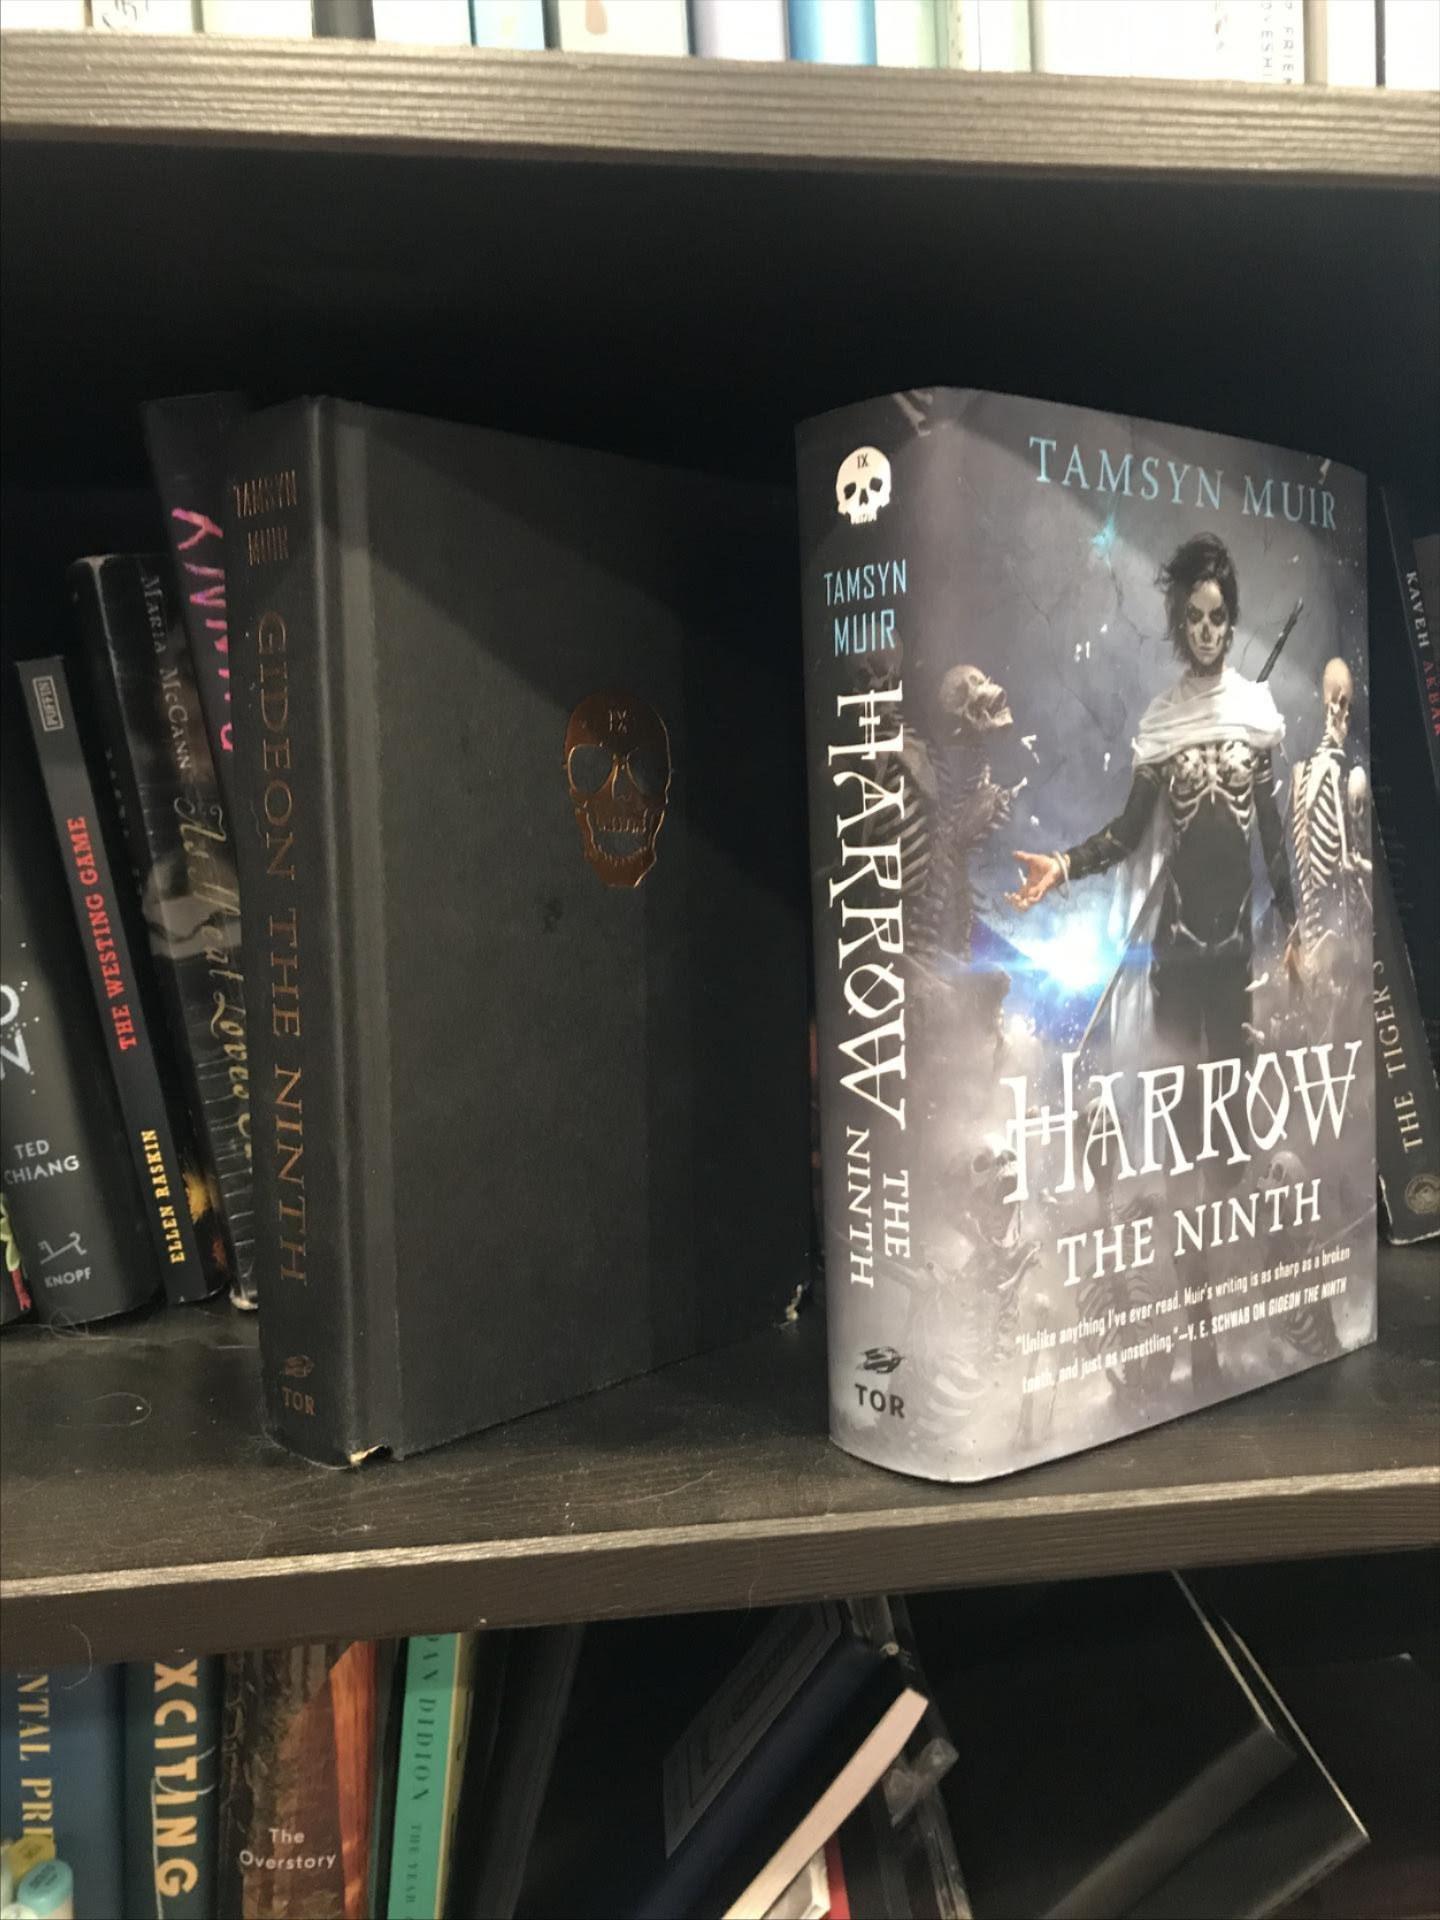 natalie's locked tomb books on a shelf